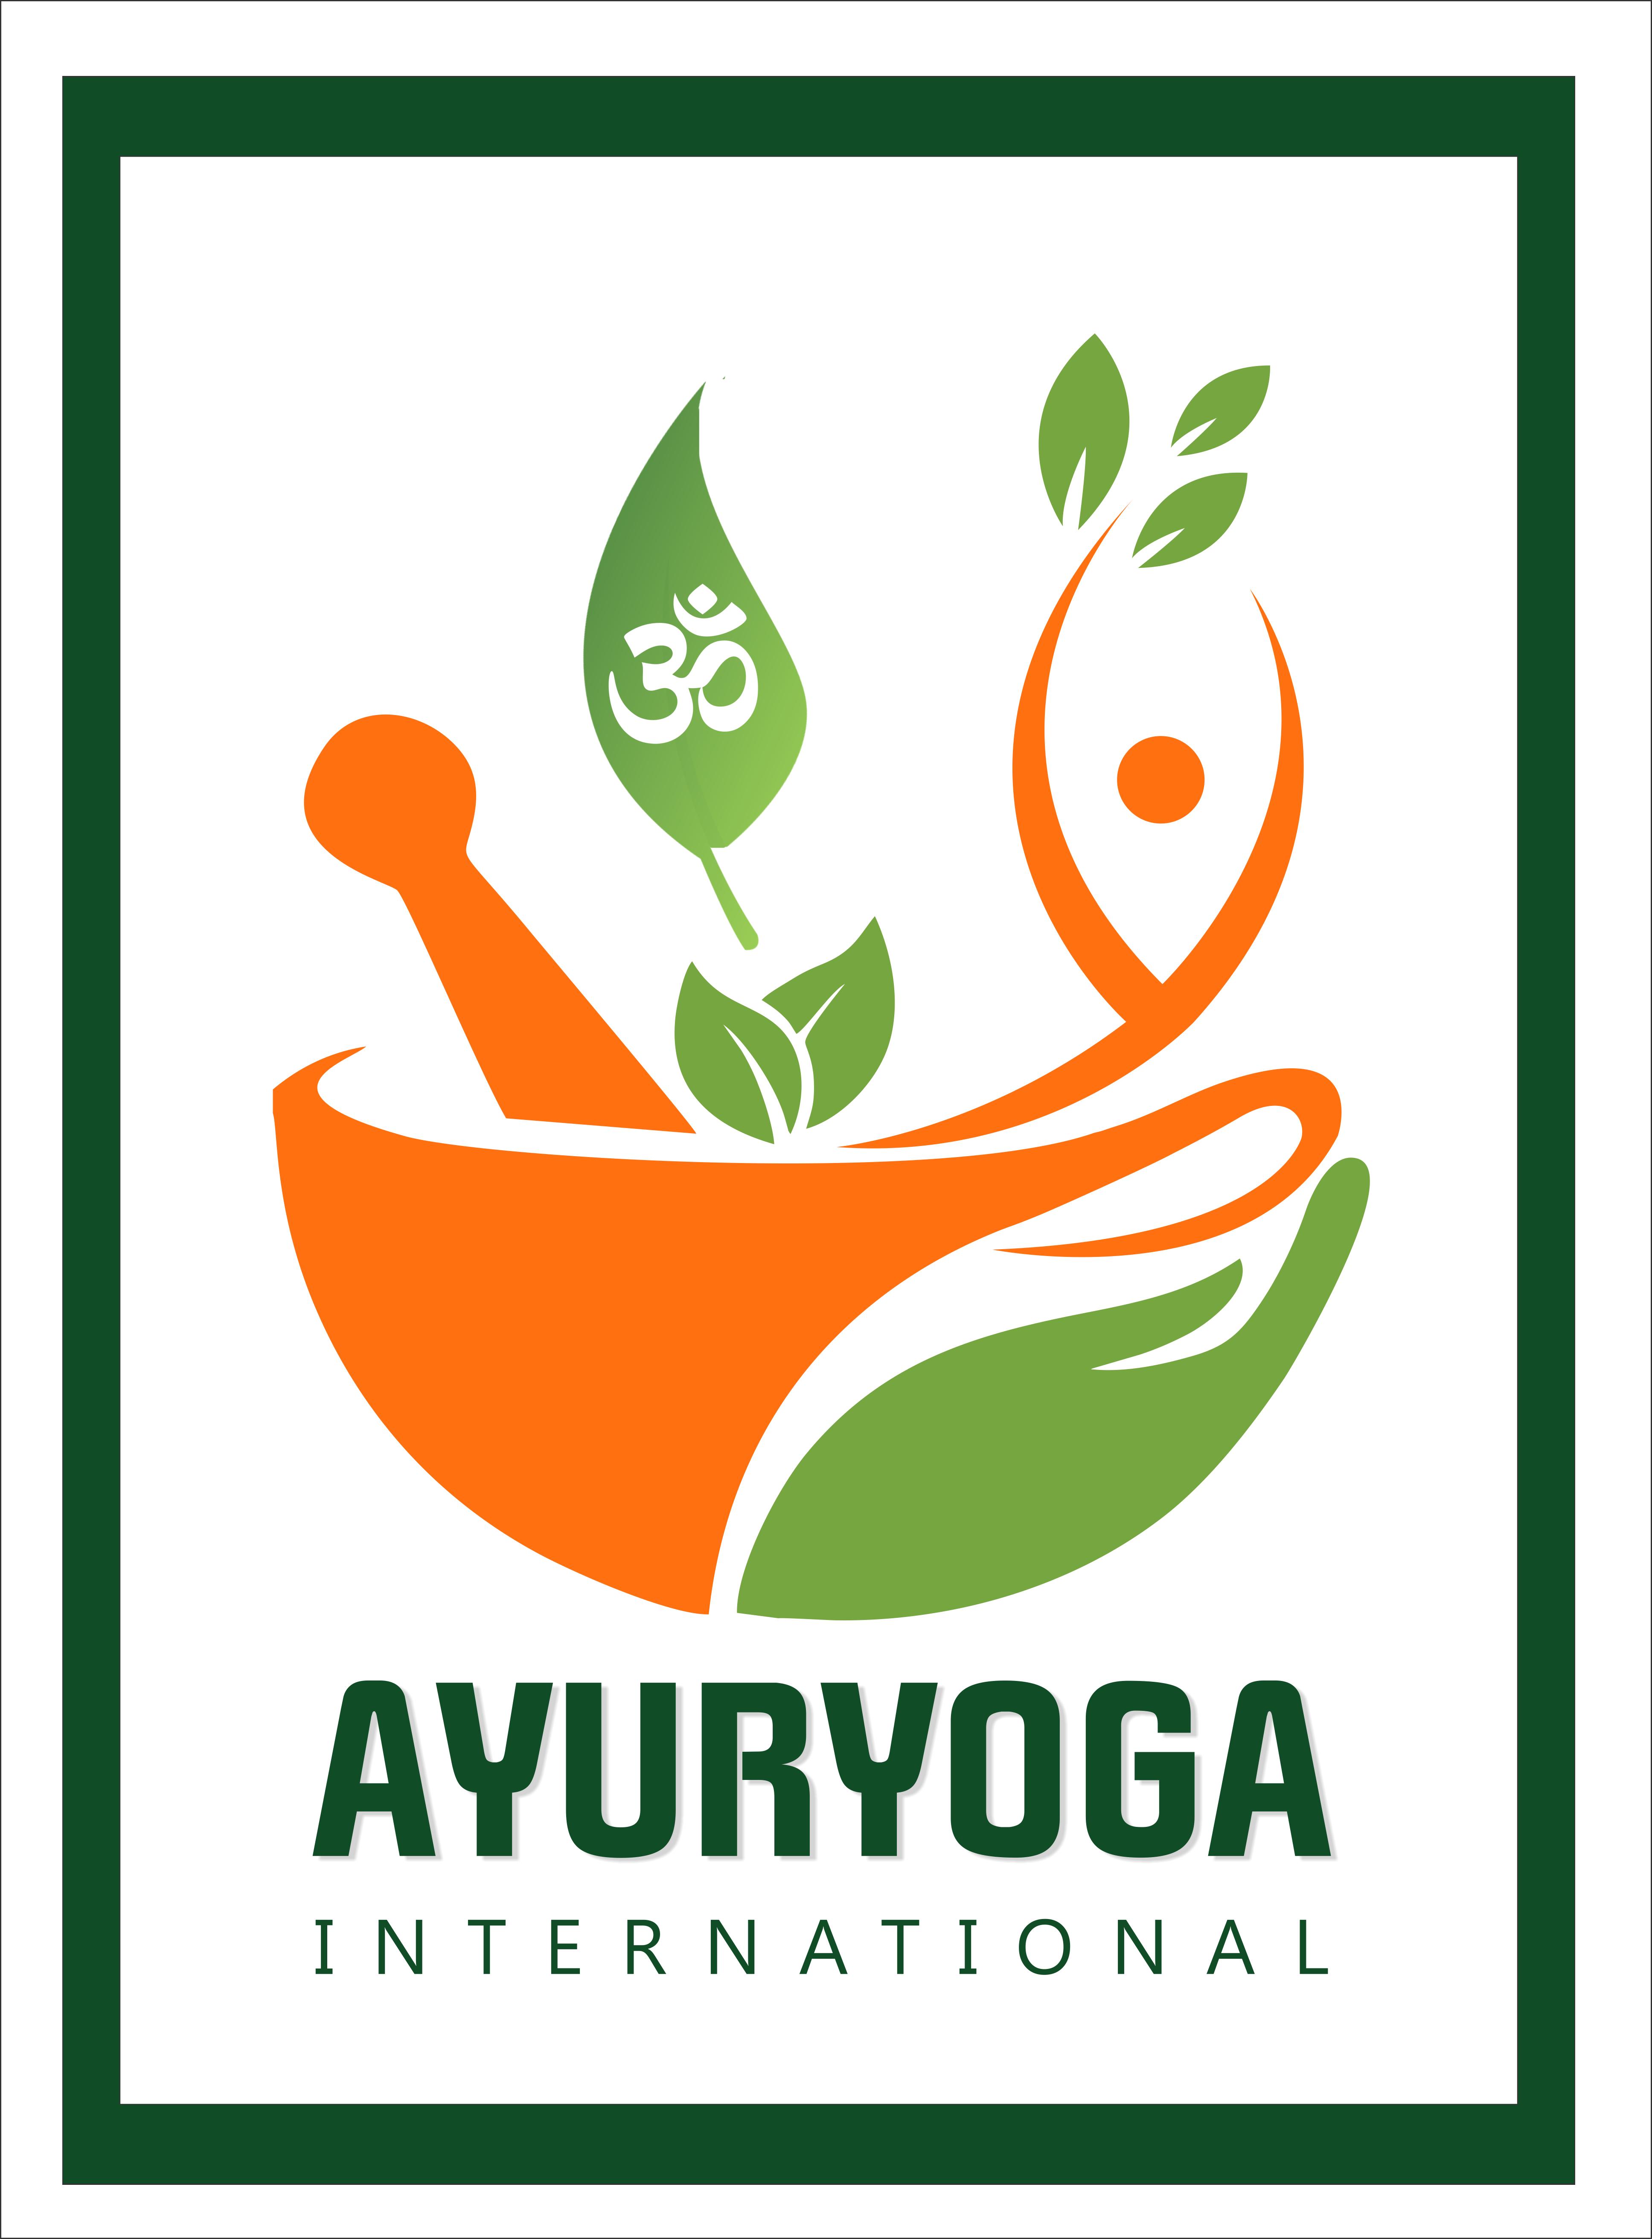 Ayuryoga International Potrait Logo